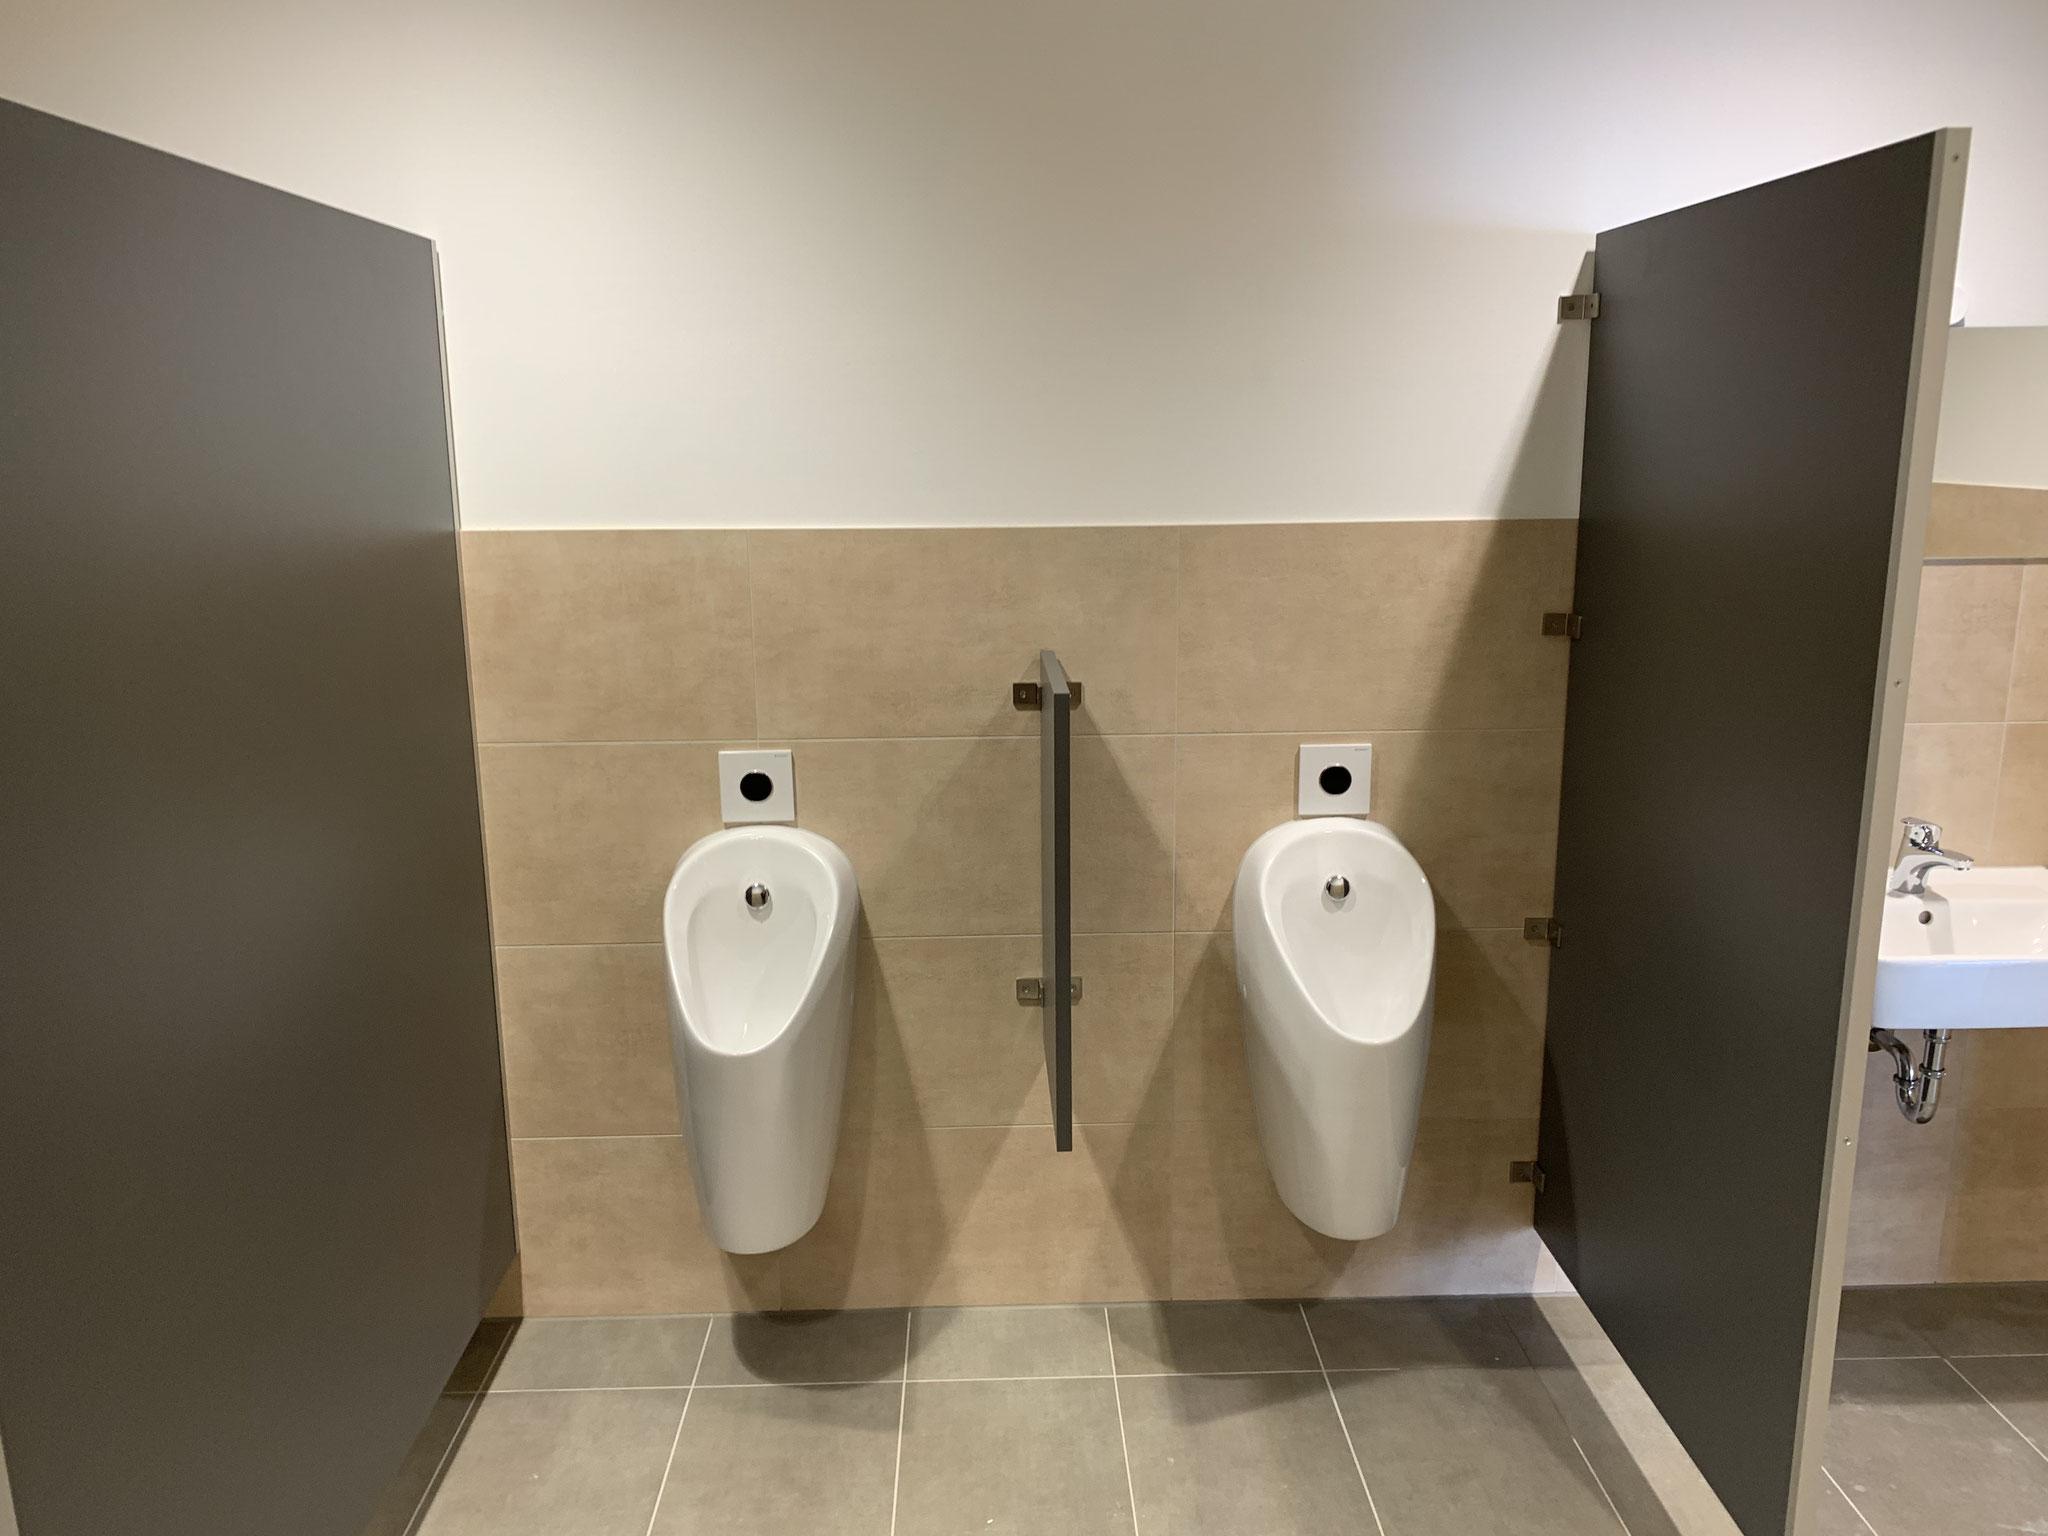 Urinale mit integrirter Näherungselektronik